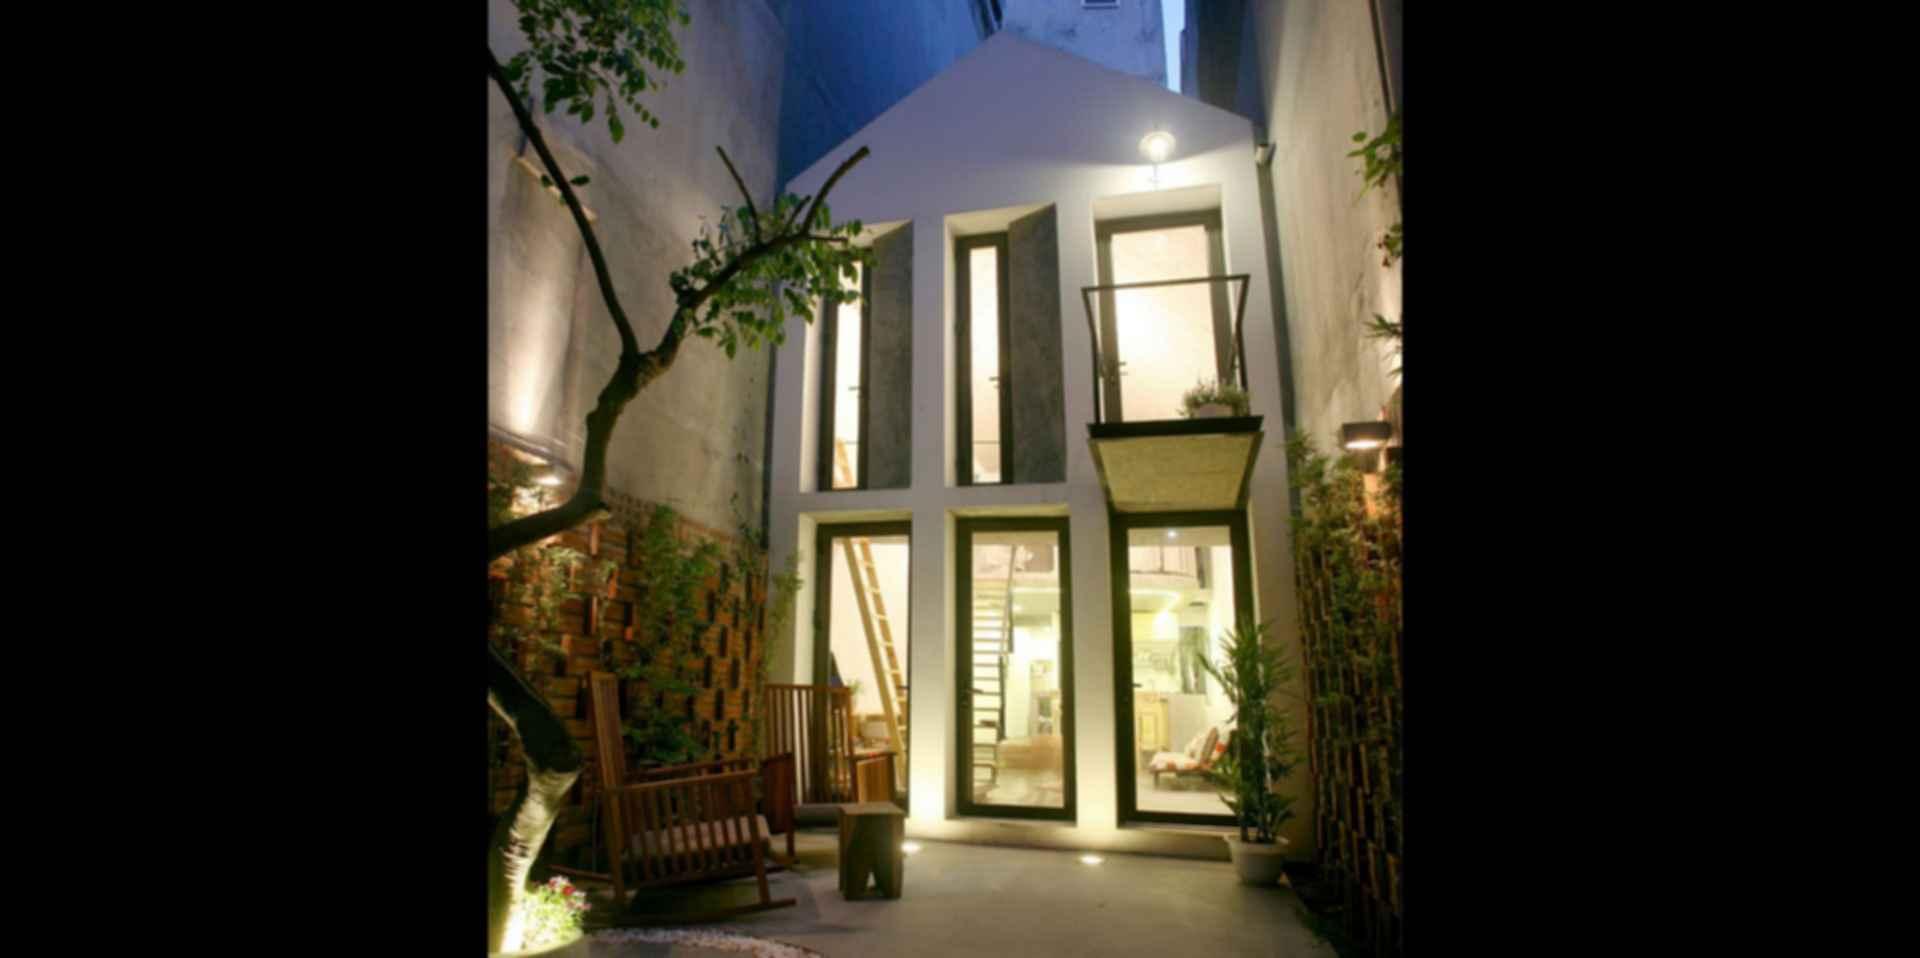 Maison T House - Exterior/Outdoor Area